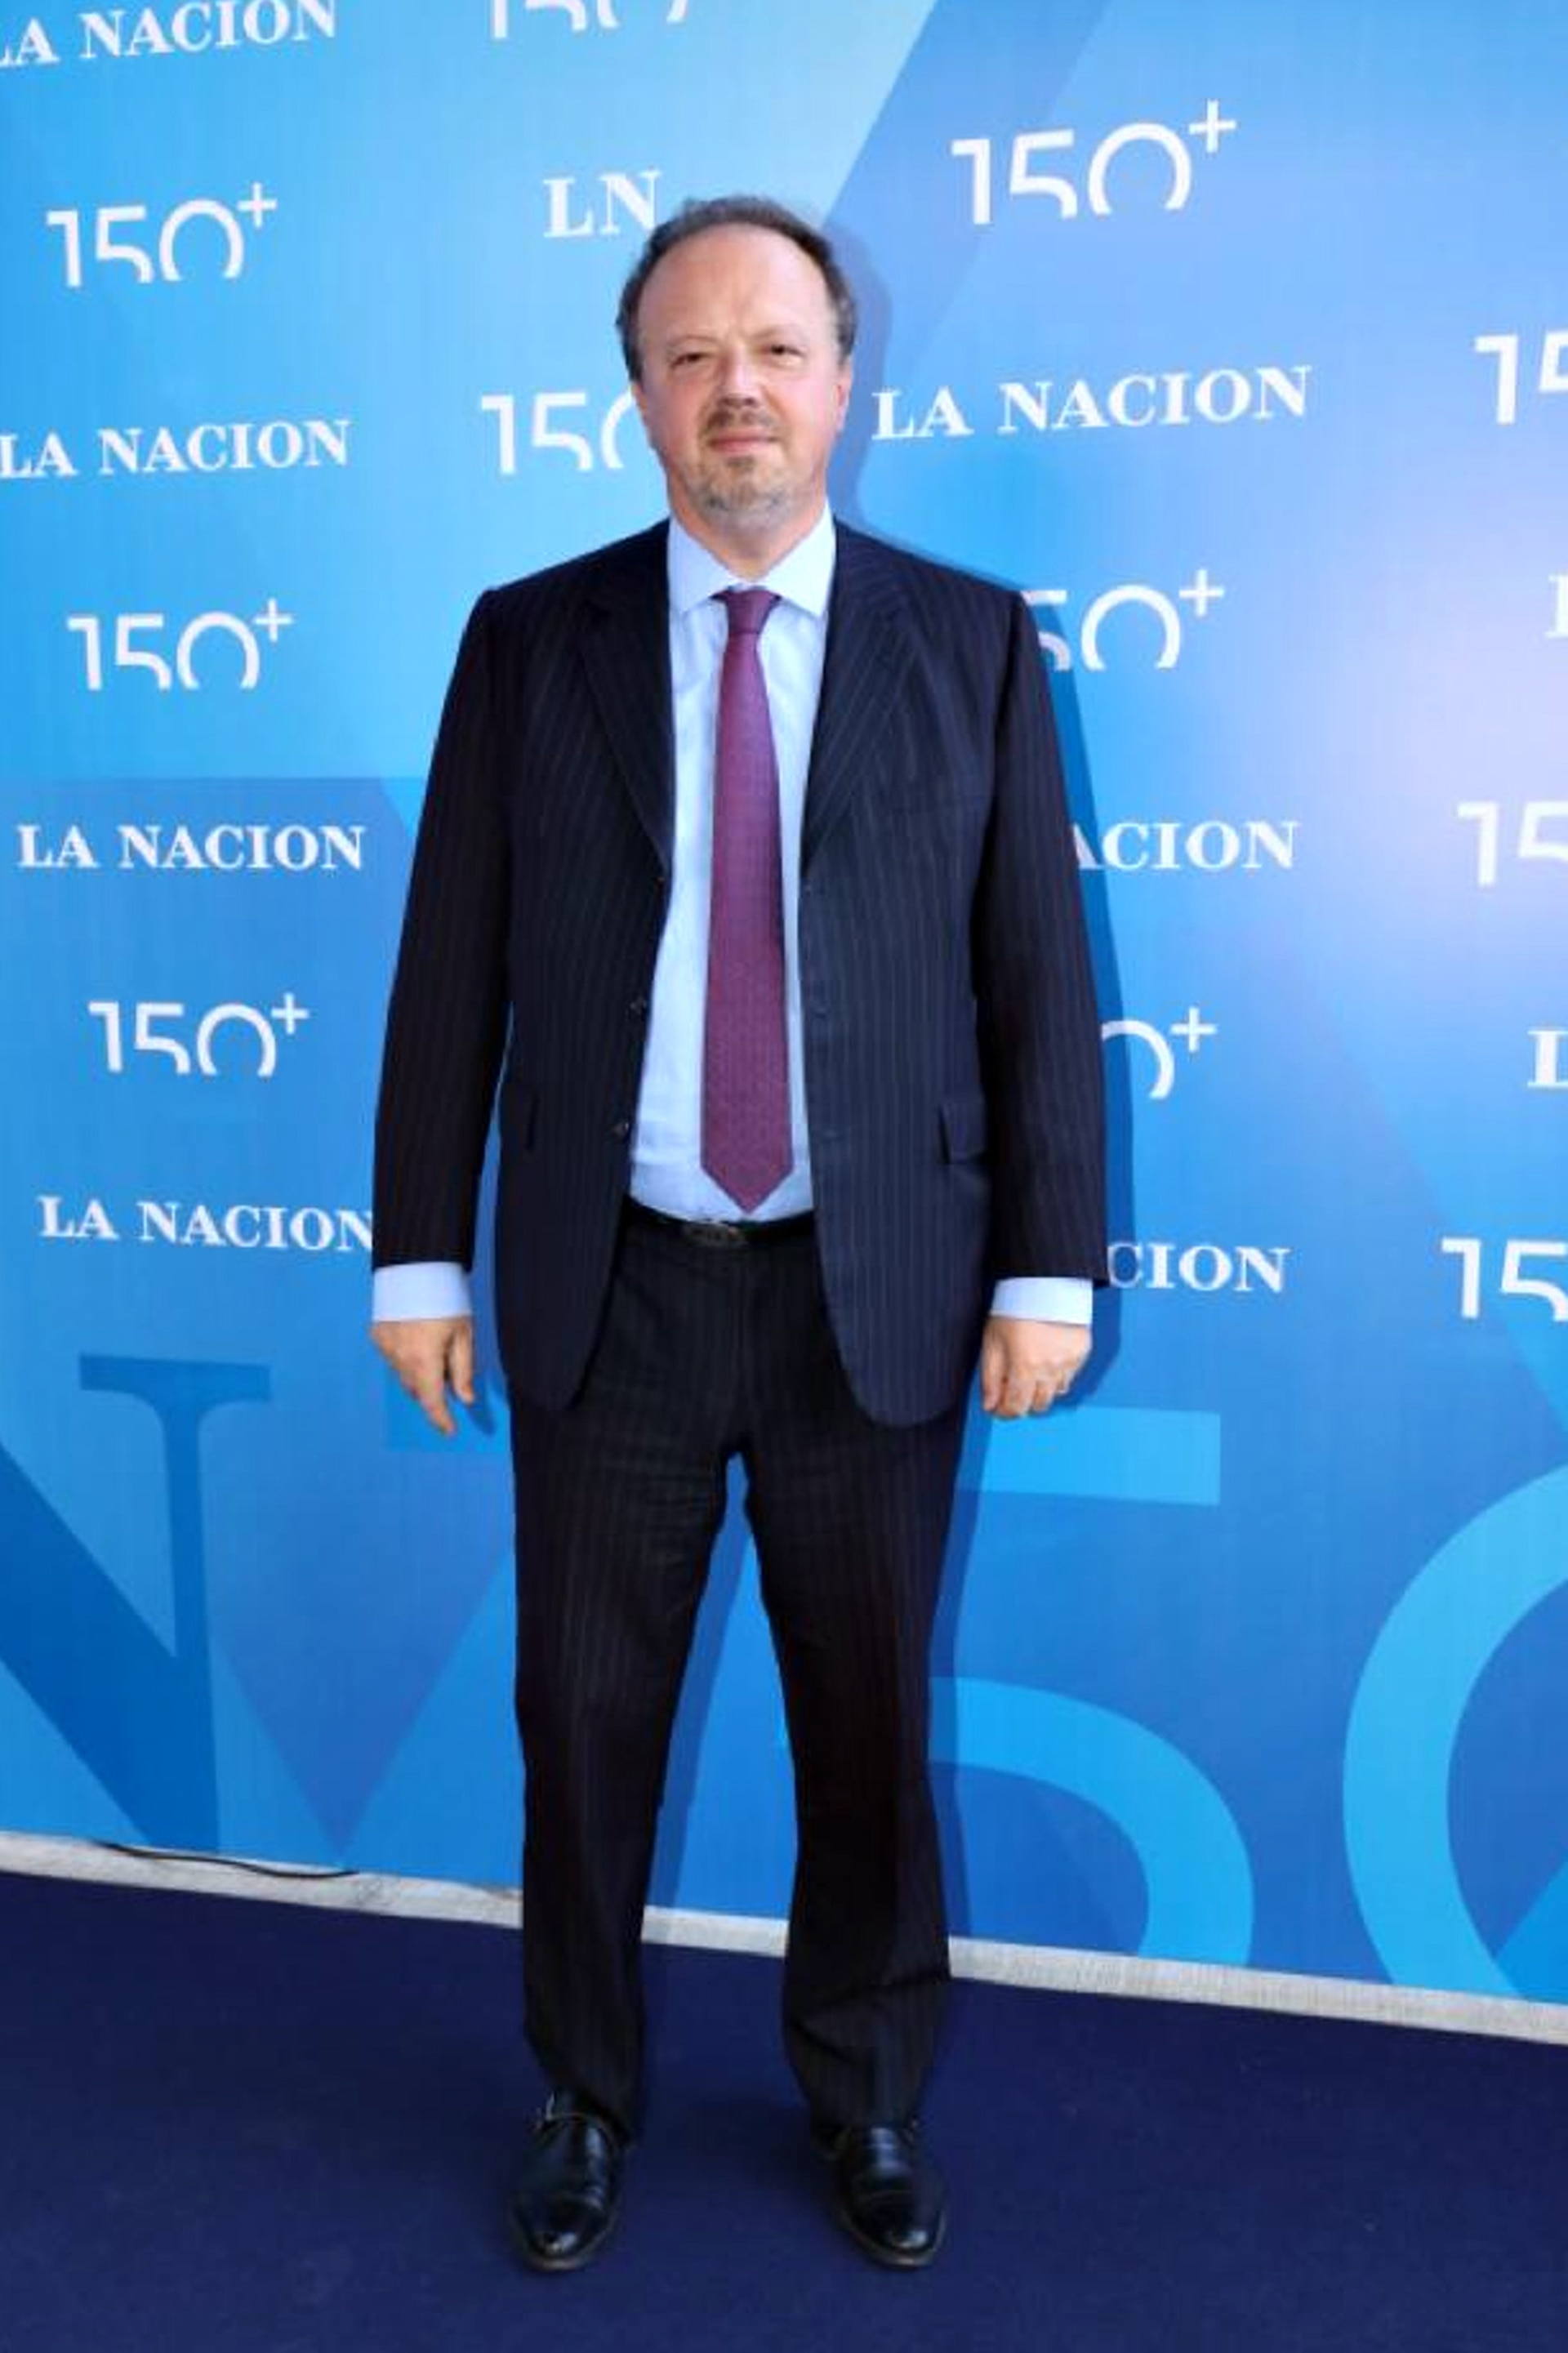 Juan Nápoli del Banco de Valores